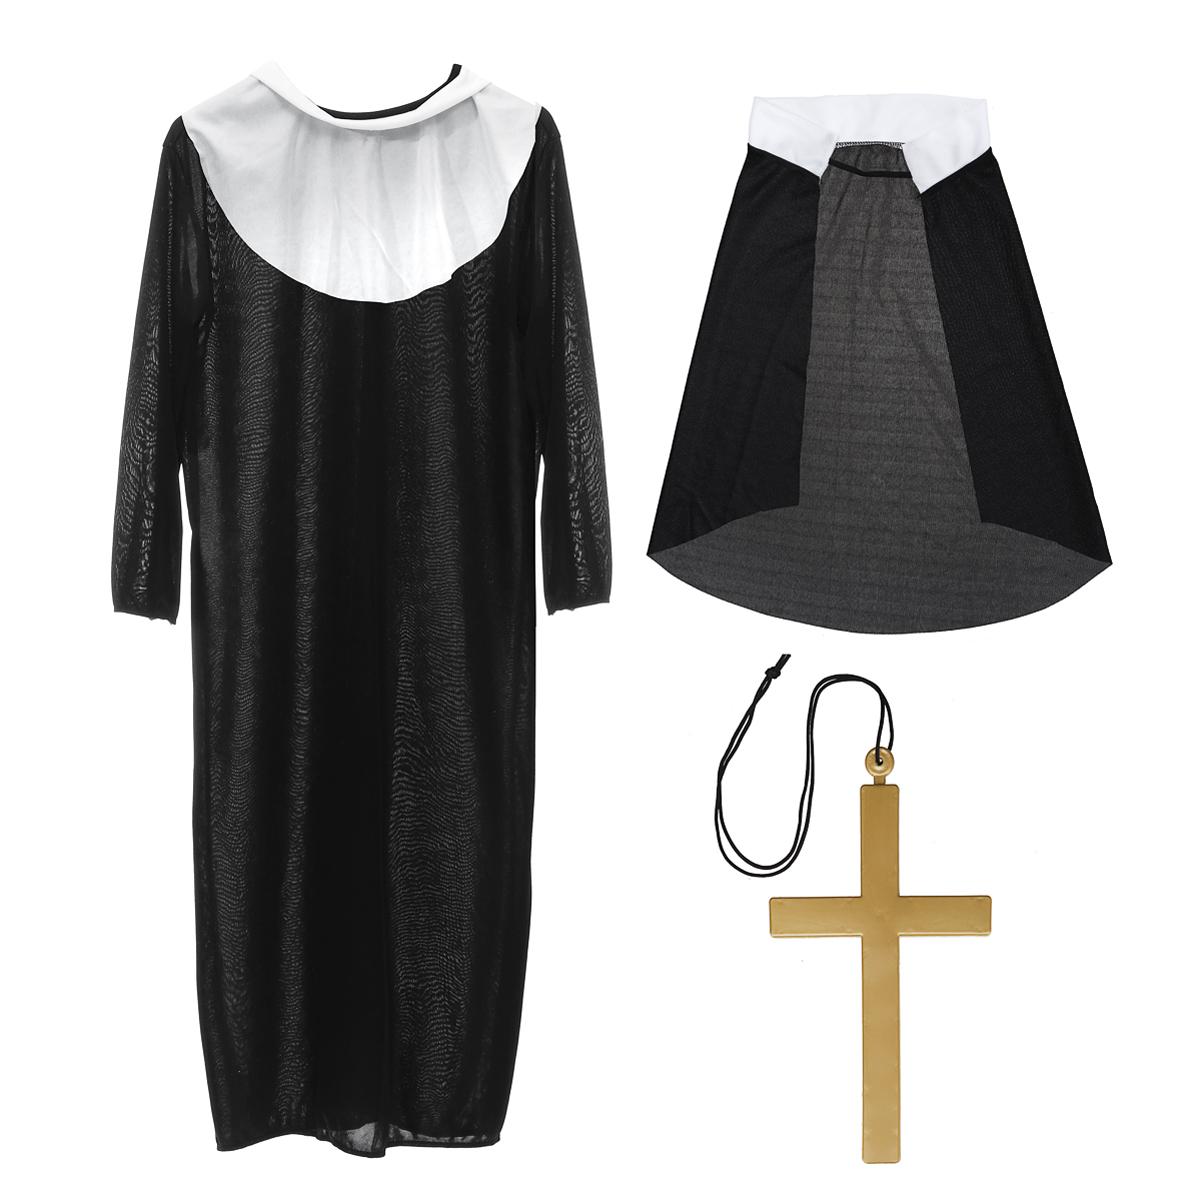 Three-piece The Horror Nun Costume Dreadful Women Adult Cosplay Robe Dress Suit Halloween